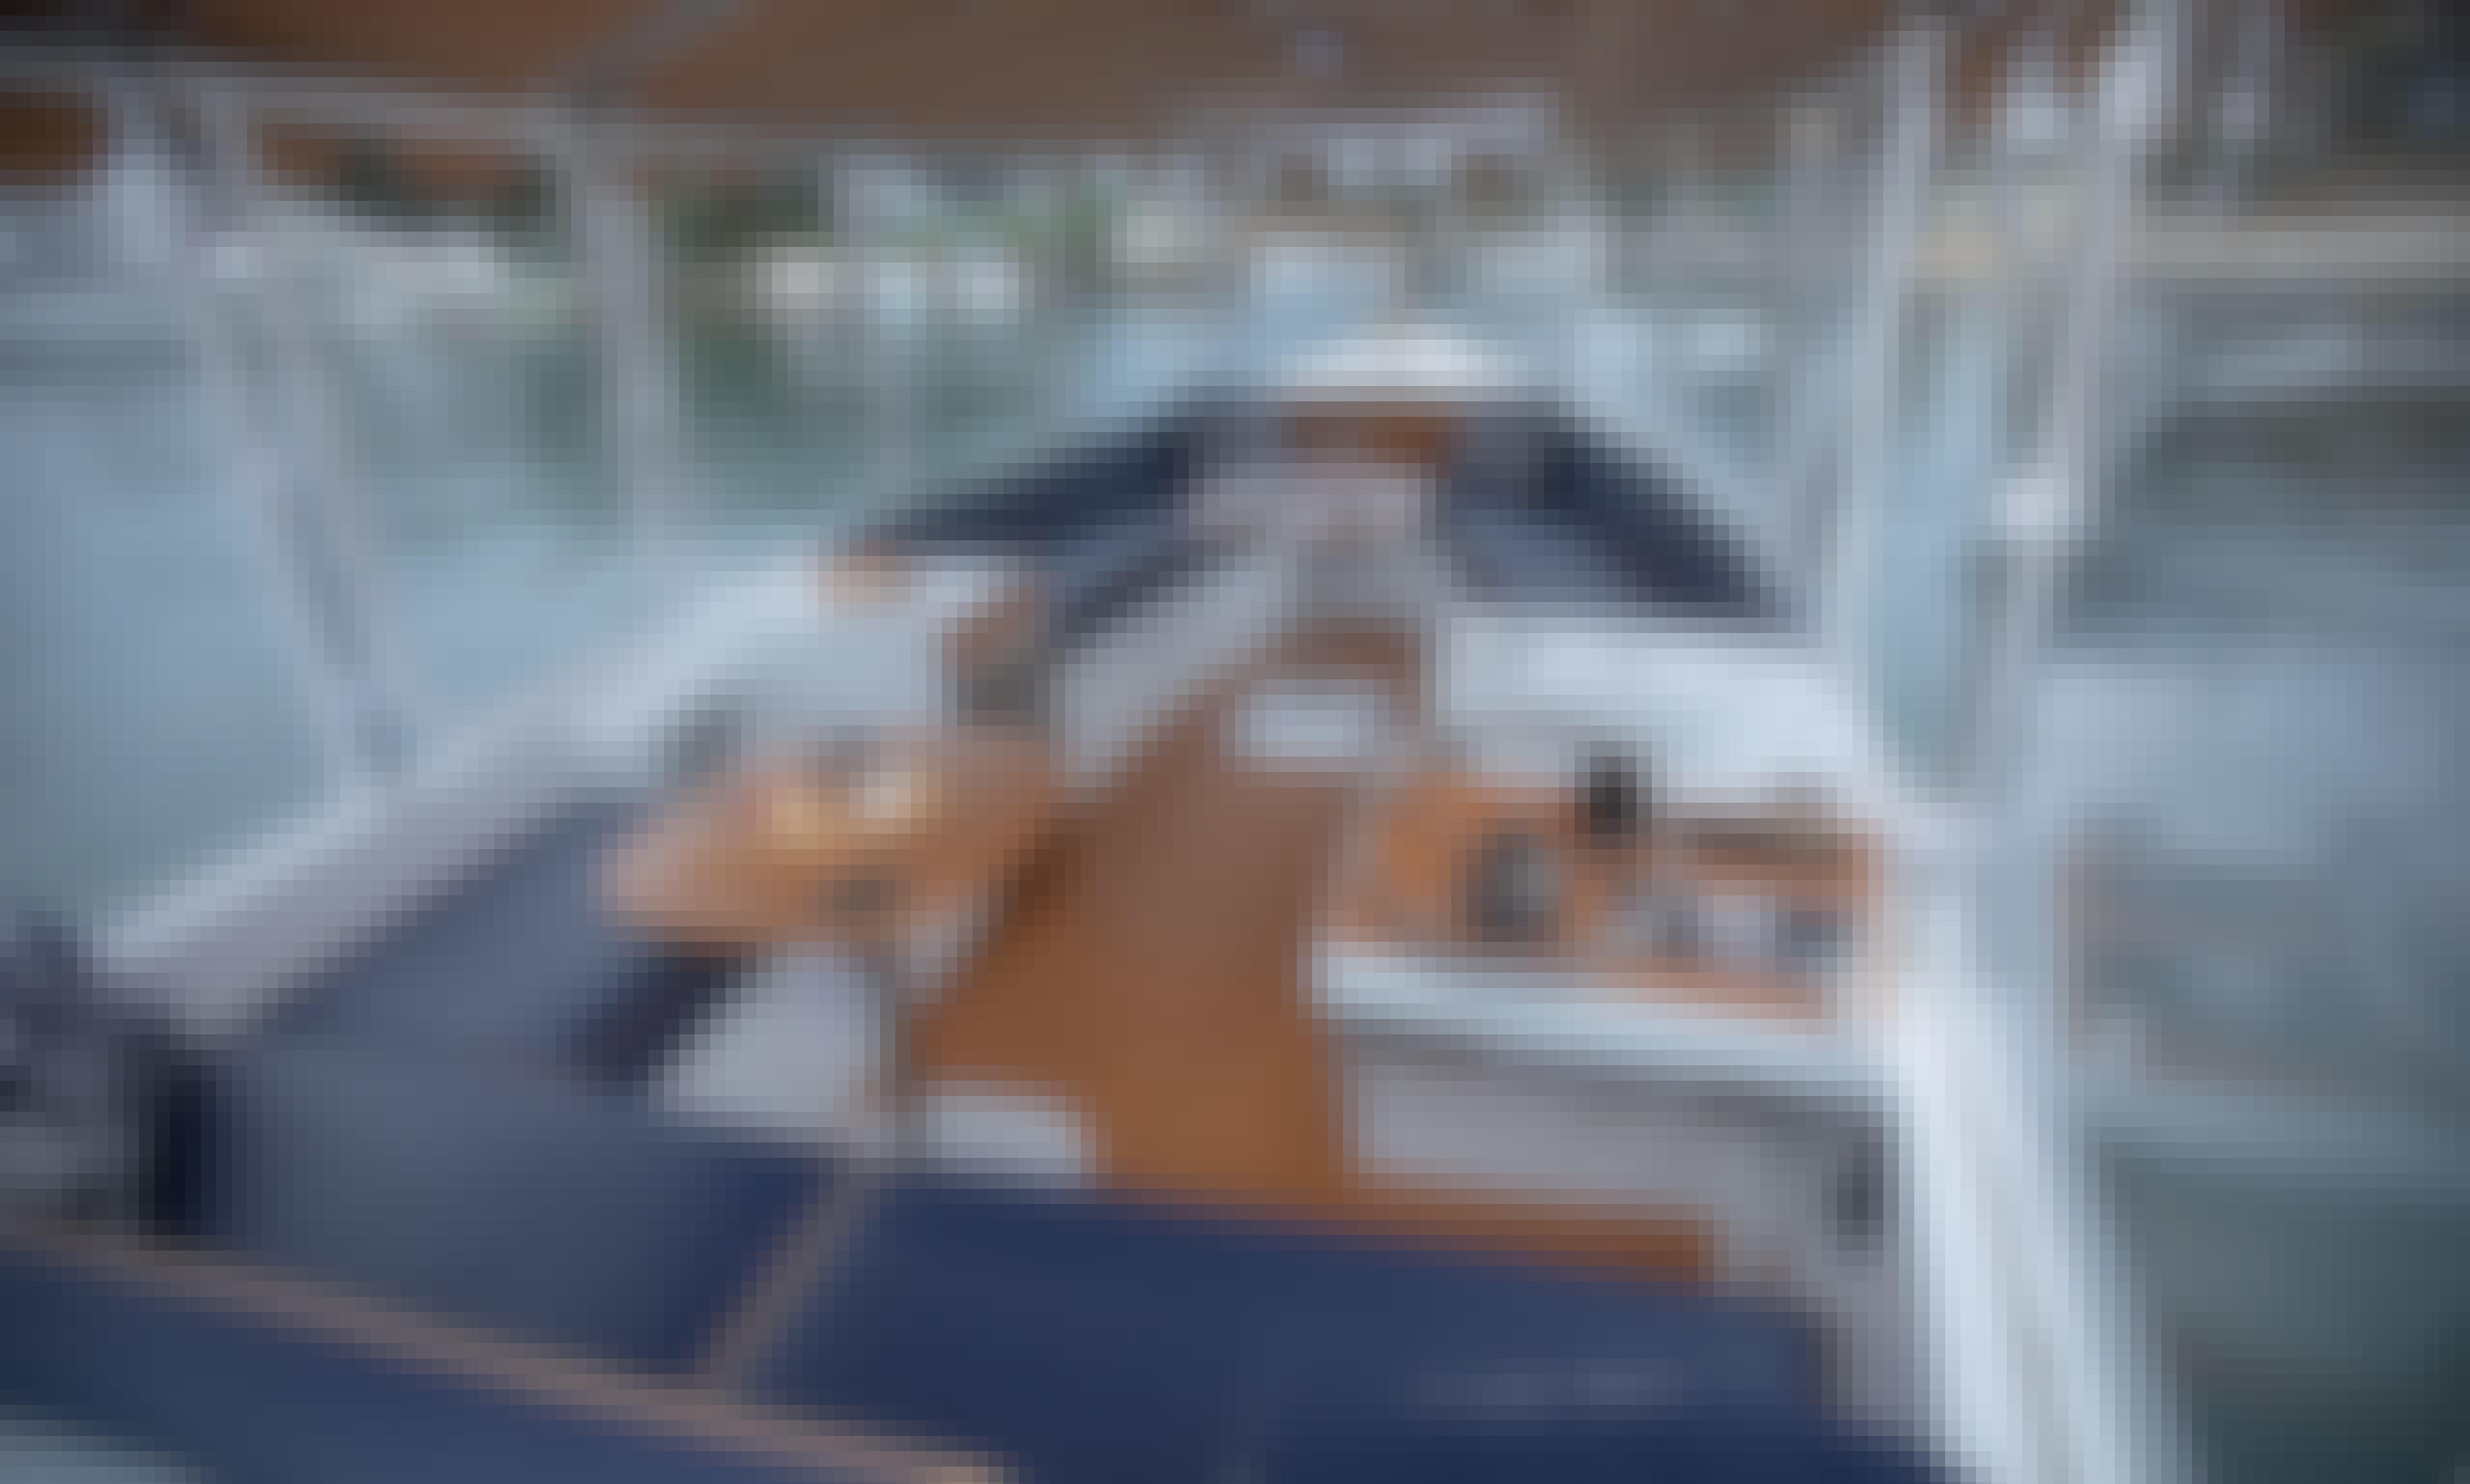 21' Duffy Electric Boat in Beautiful Newport Beach